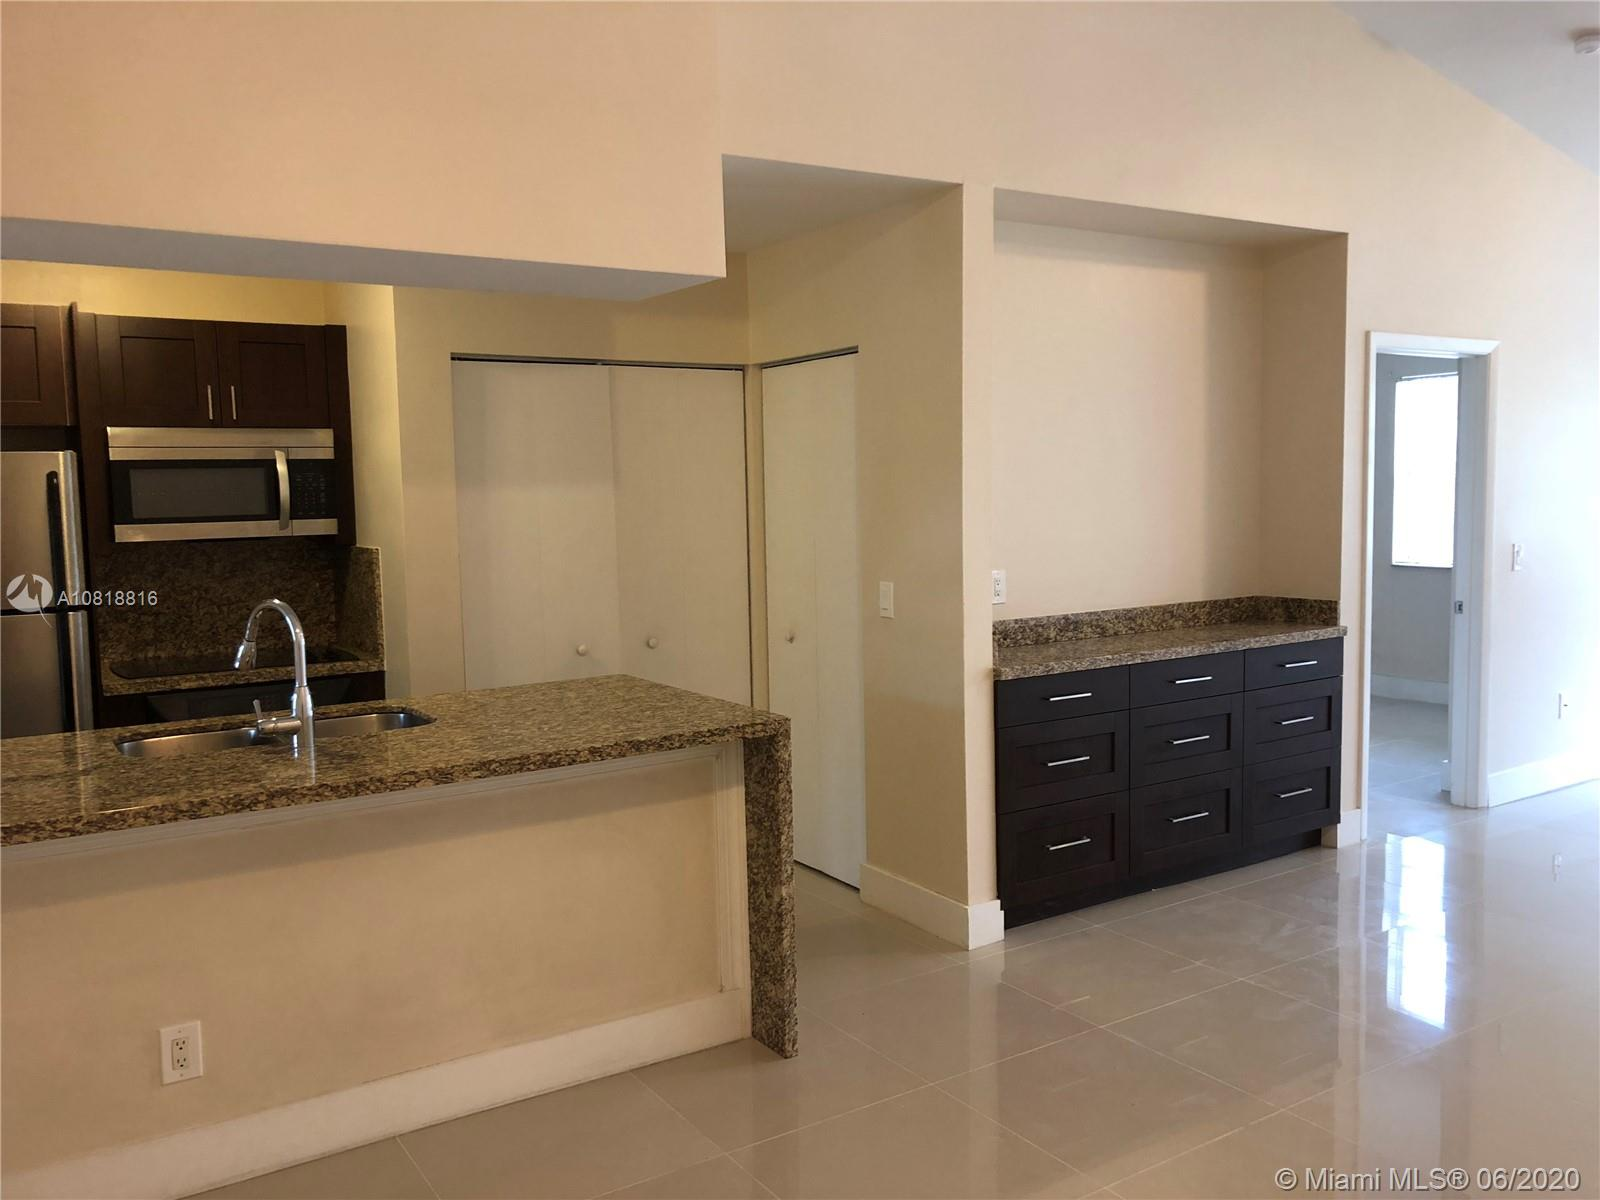 18350 NW 68th Ave #I, Hialeah, FL 33015 - Hialeah, FL real estate listing